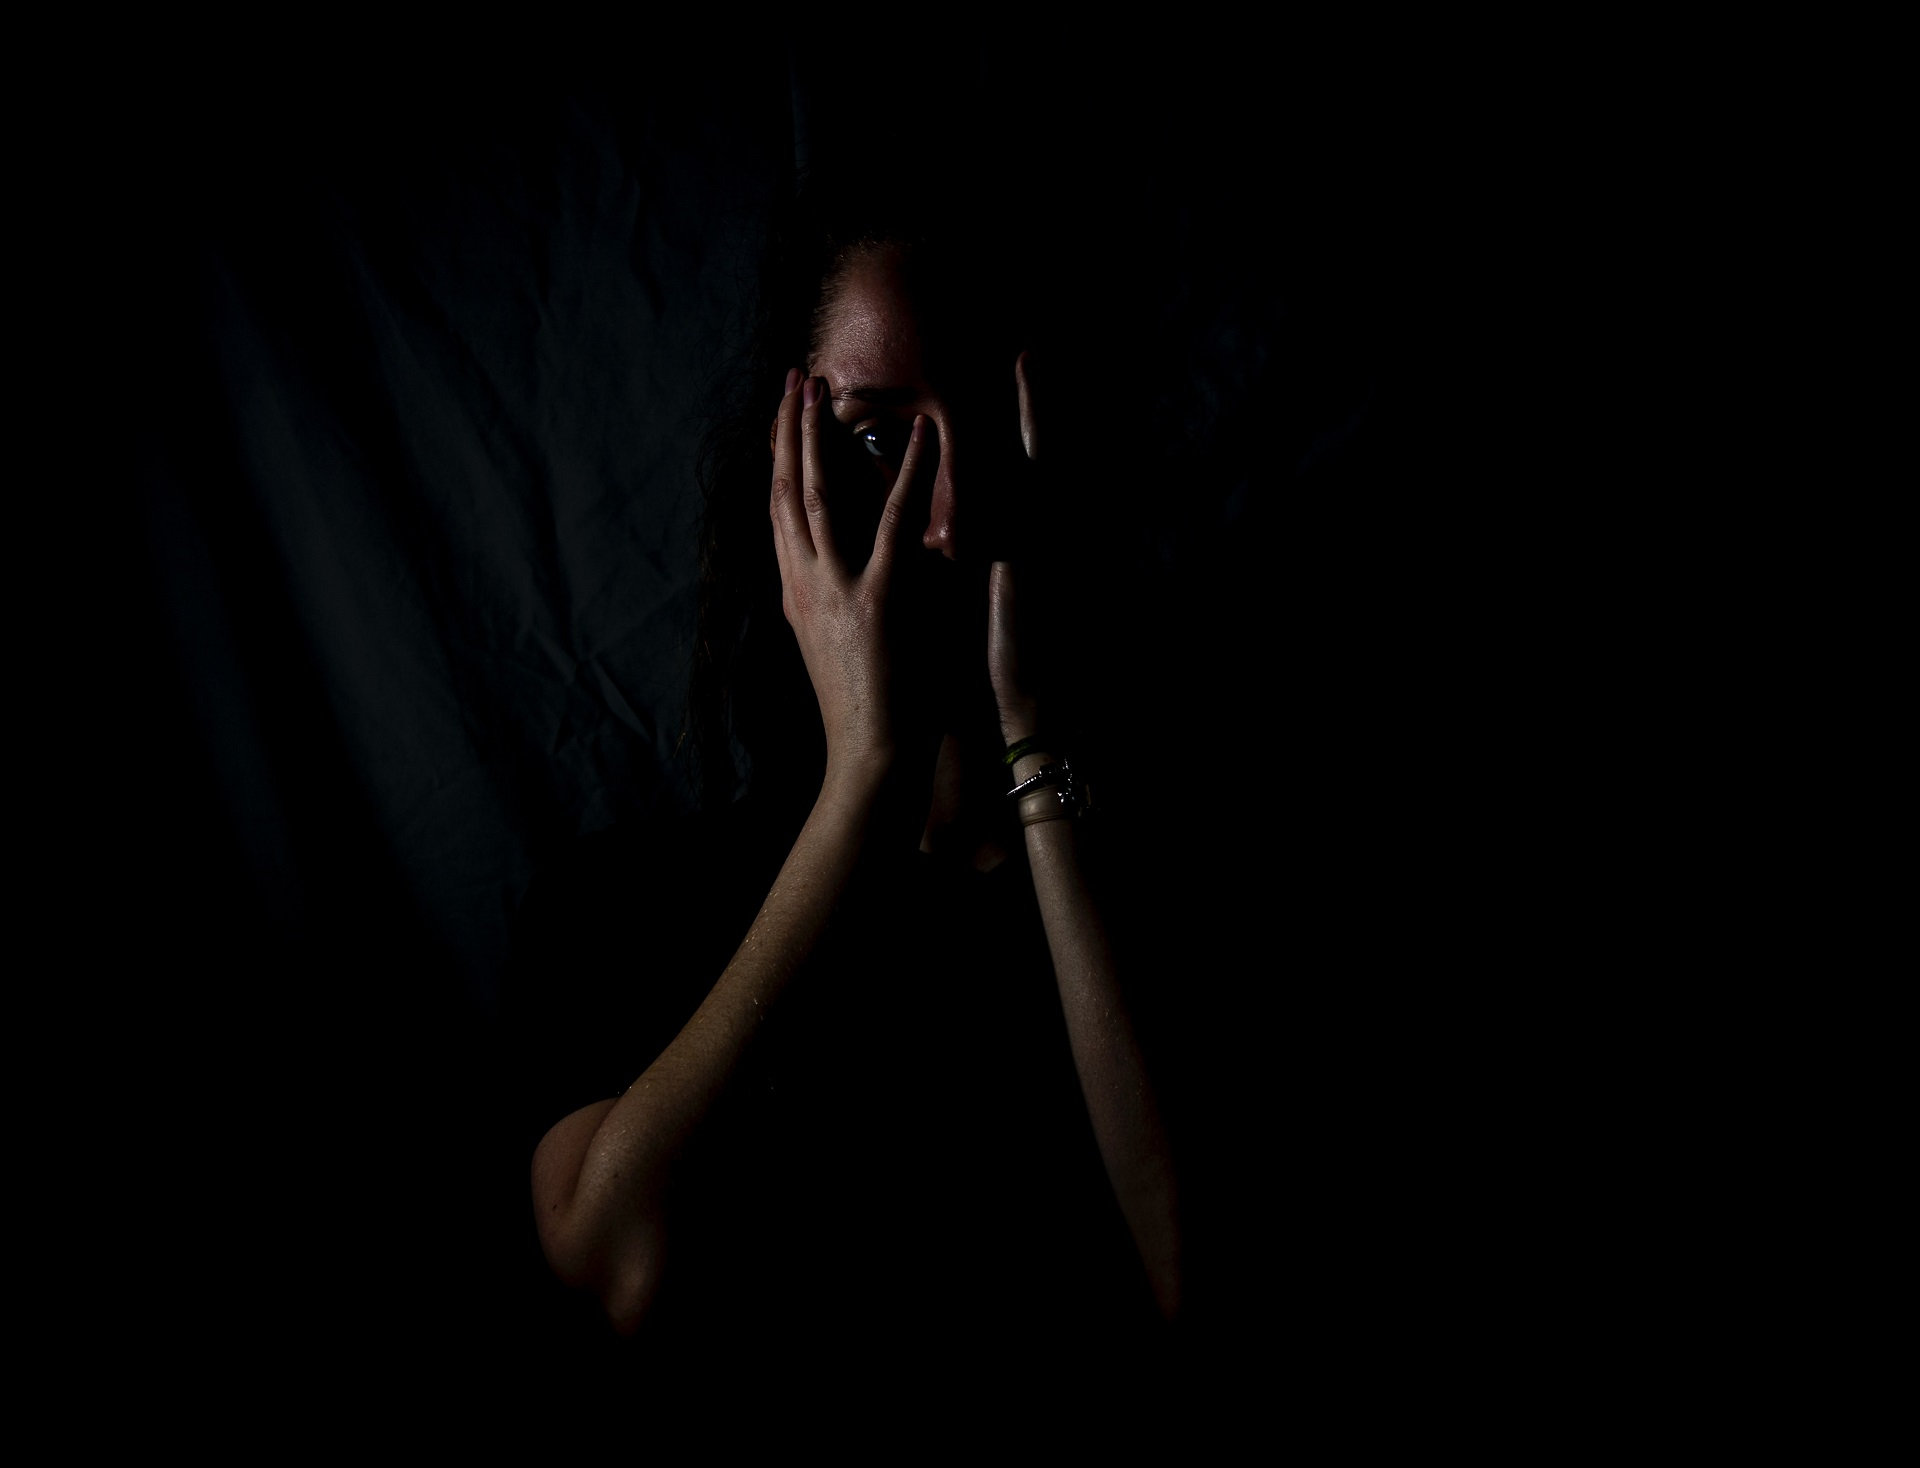 women-with-fear